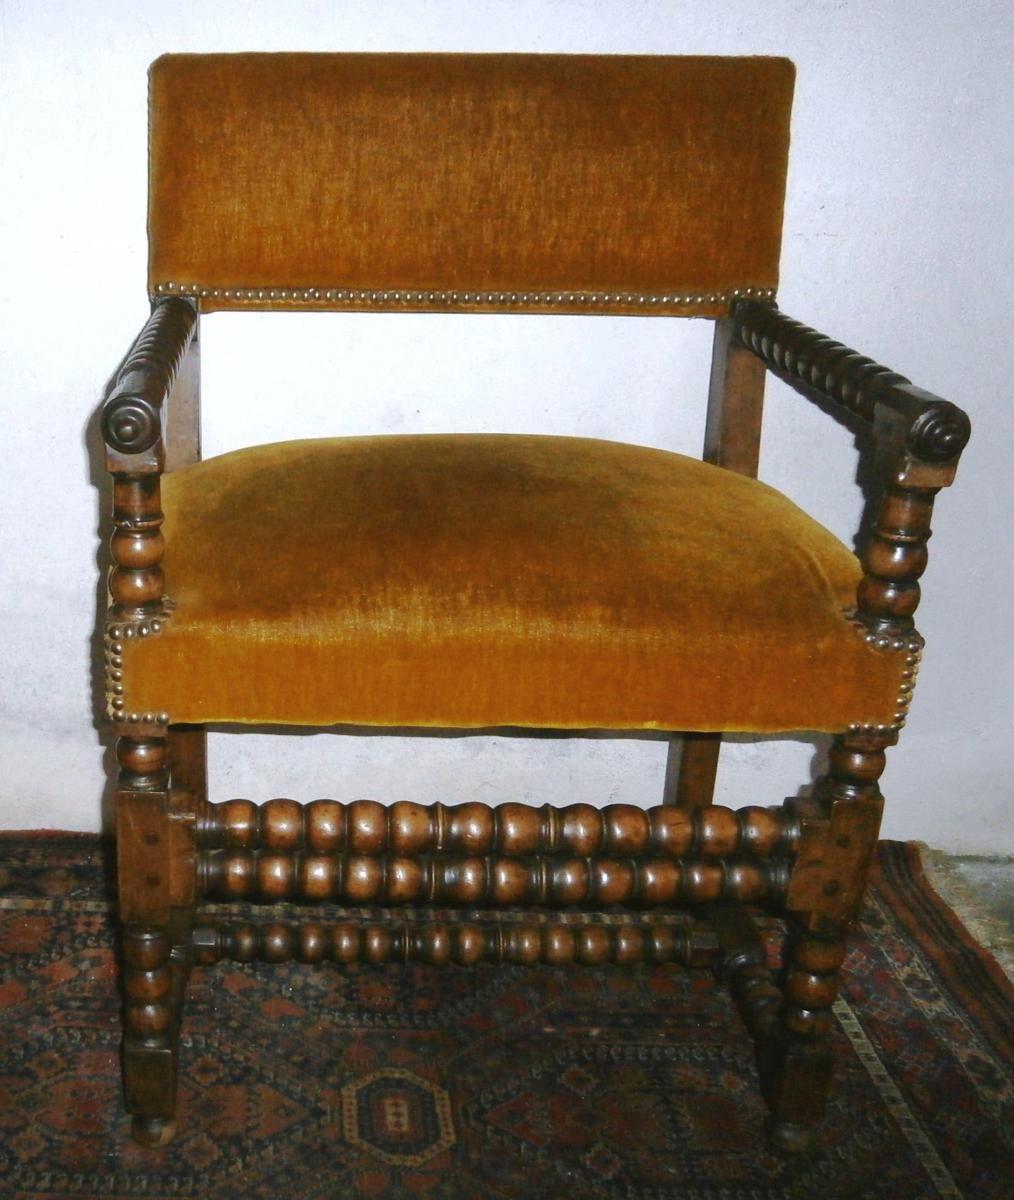 Chaise A Bras Louis Xiii Antiquites Christian Ganneval Proantic Fauteuil Bois Chaise